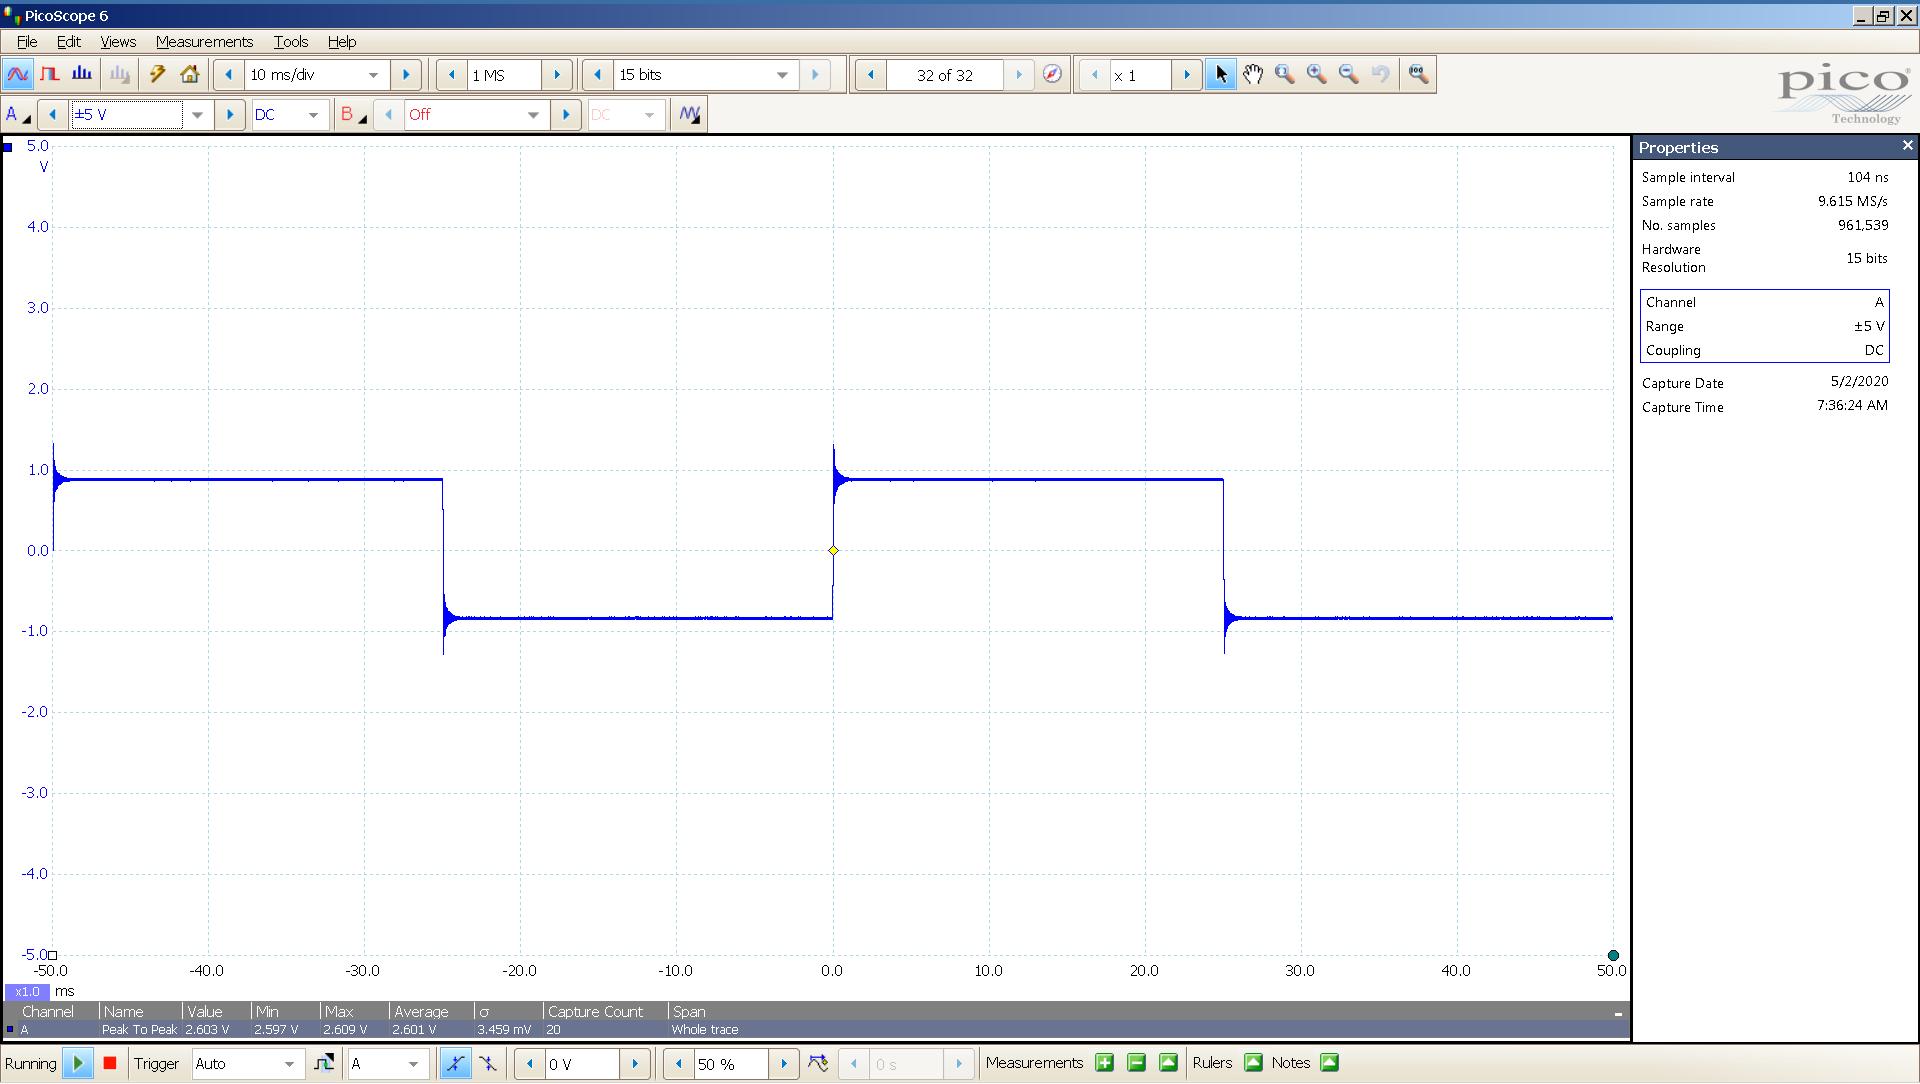 20200502-04 KTE Spring2 20 Hz sqr -4 dBFS 2 Vpp 10mS div SE - ASIO - OS DSD.png